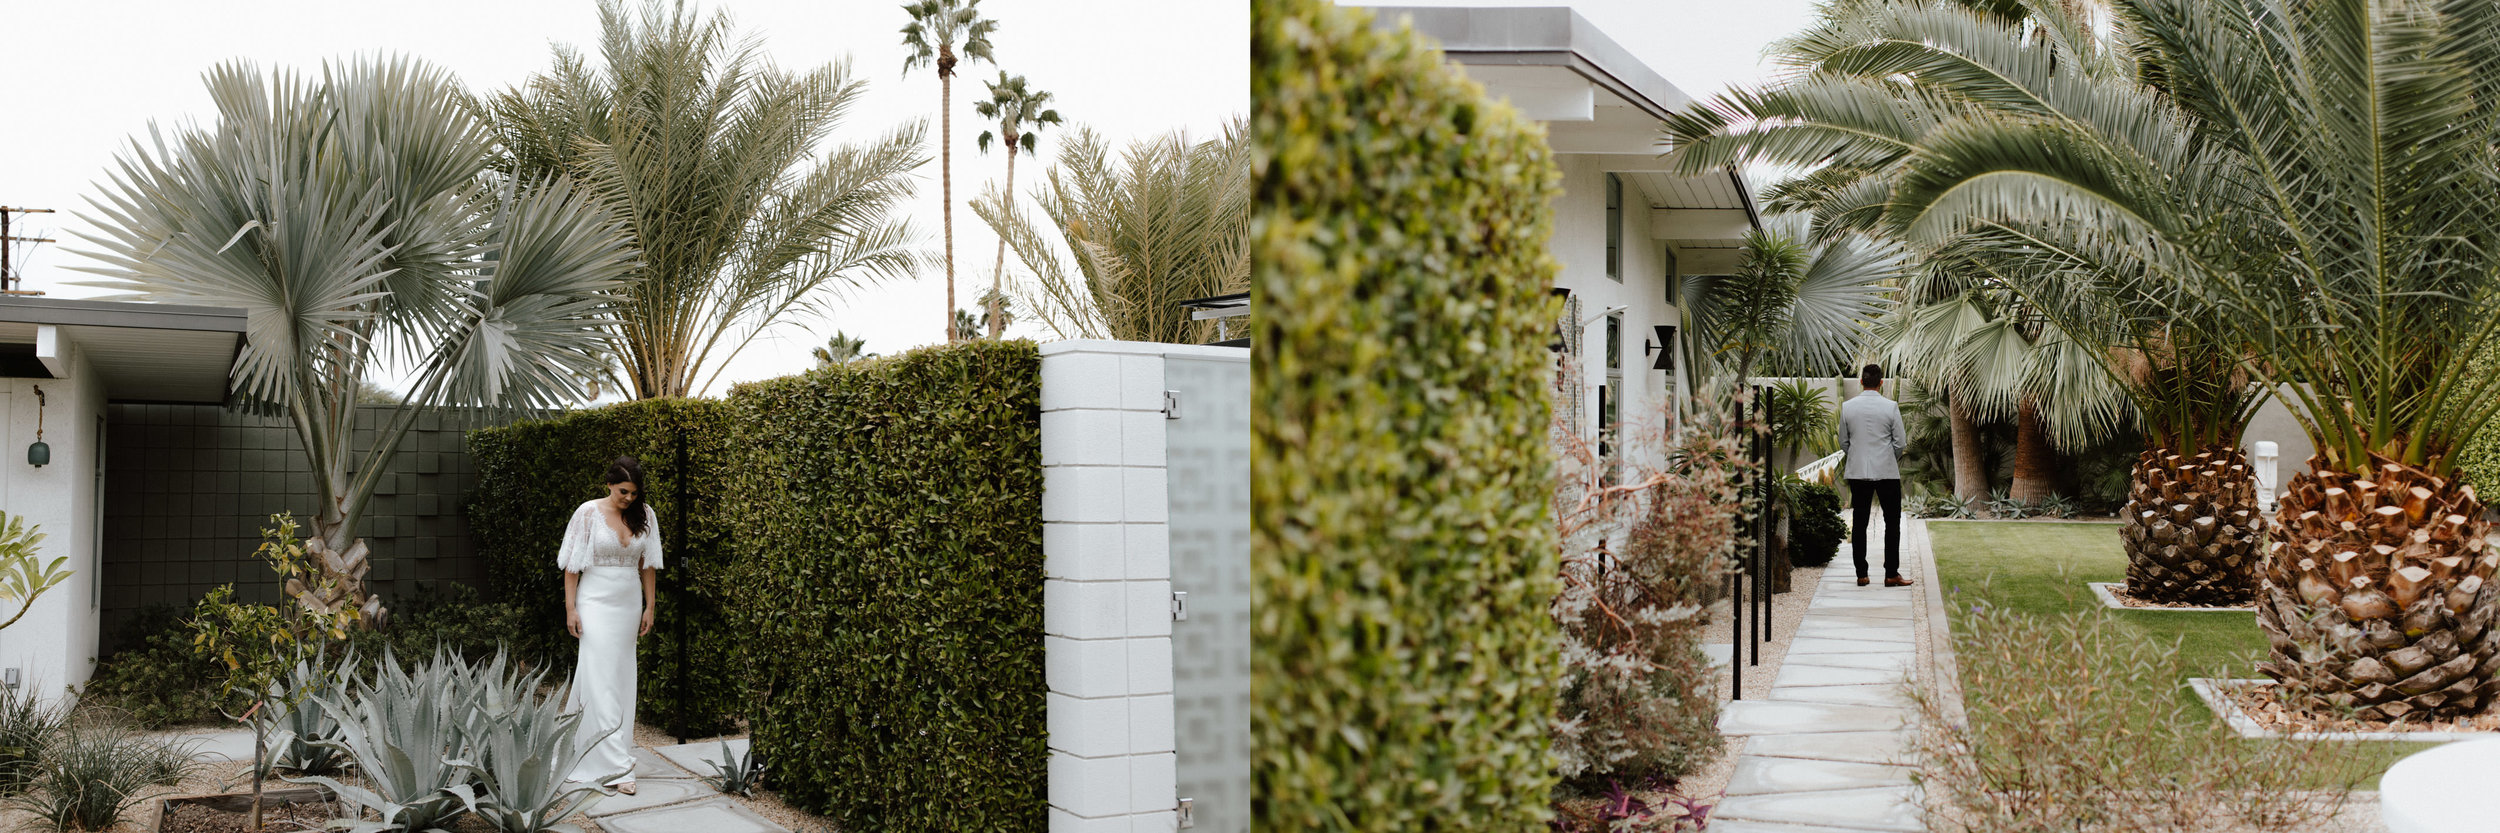 Joshua Tree America Elopement Wedding 10.jpg